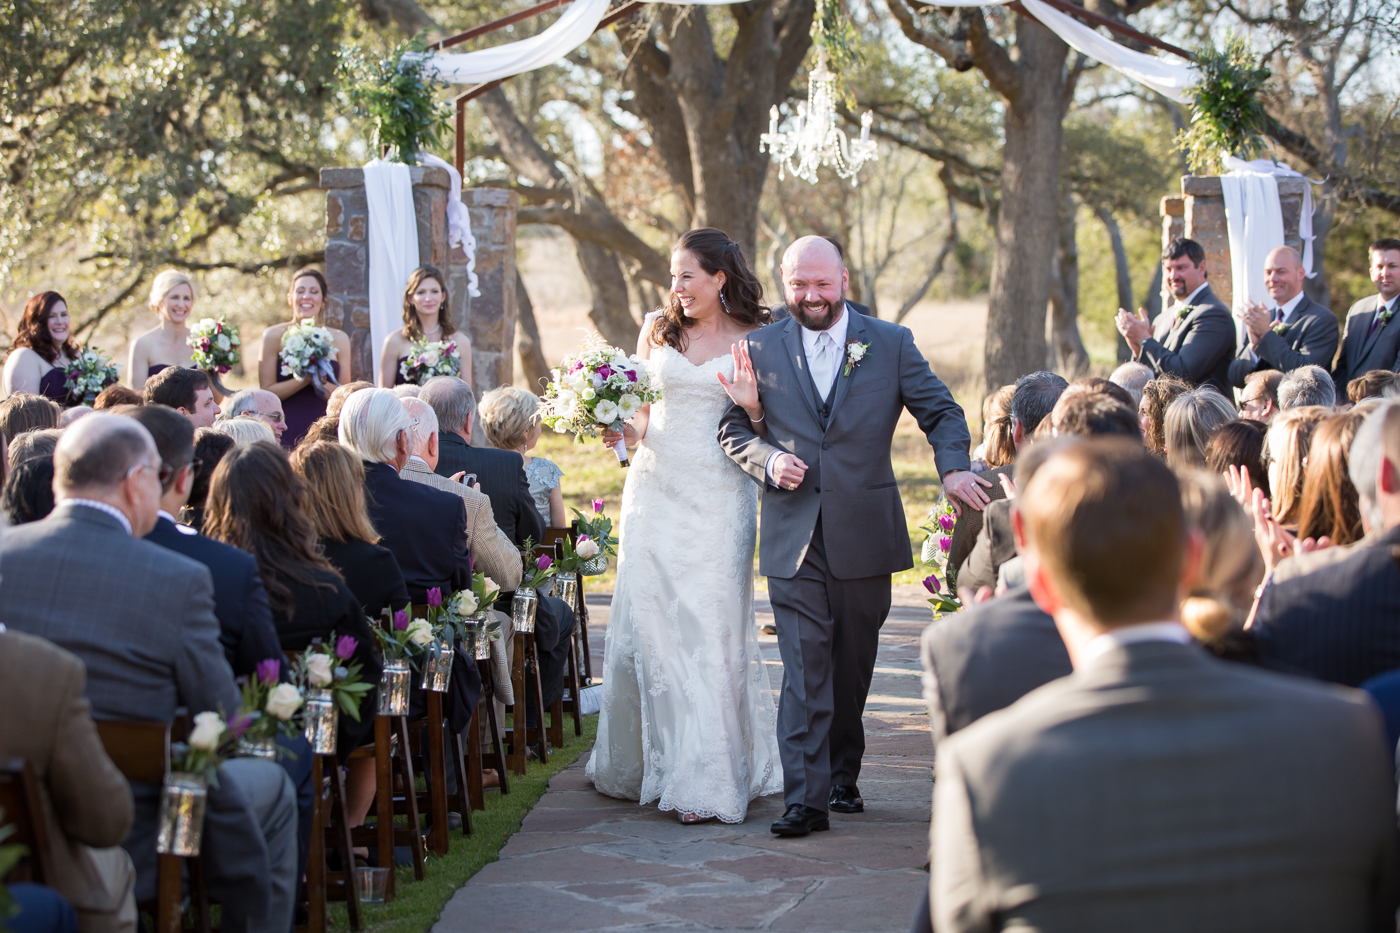 Austin-wedding-photo-and-video-023.jpg